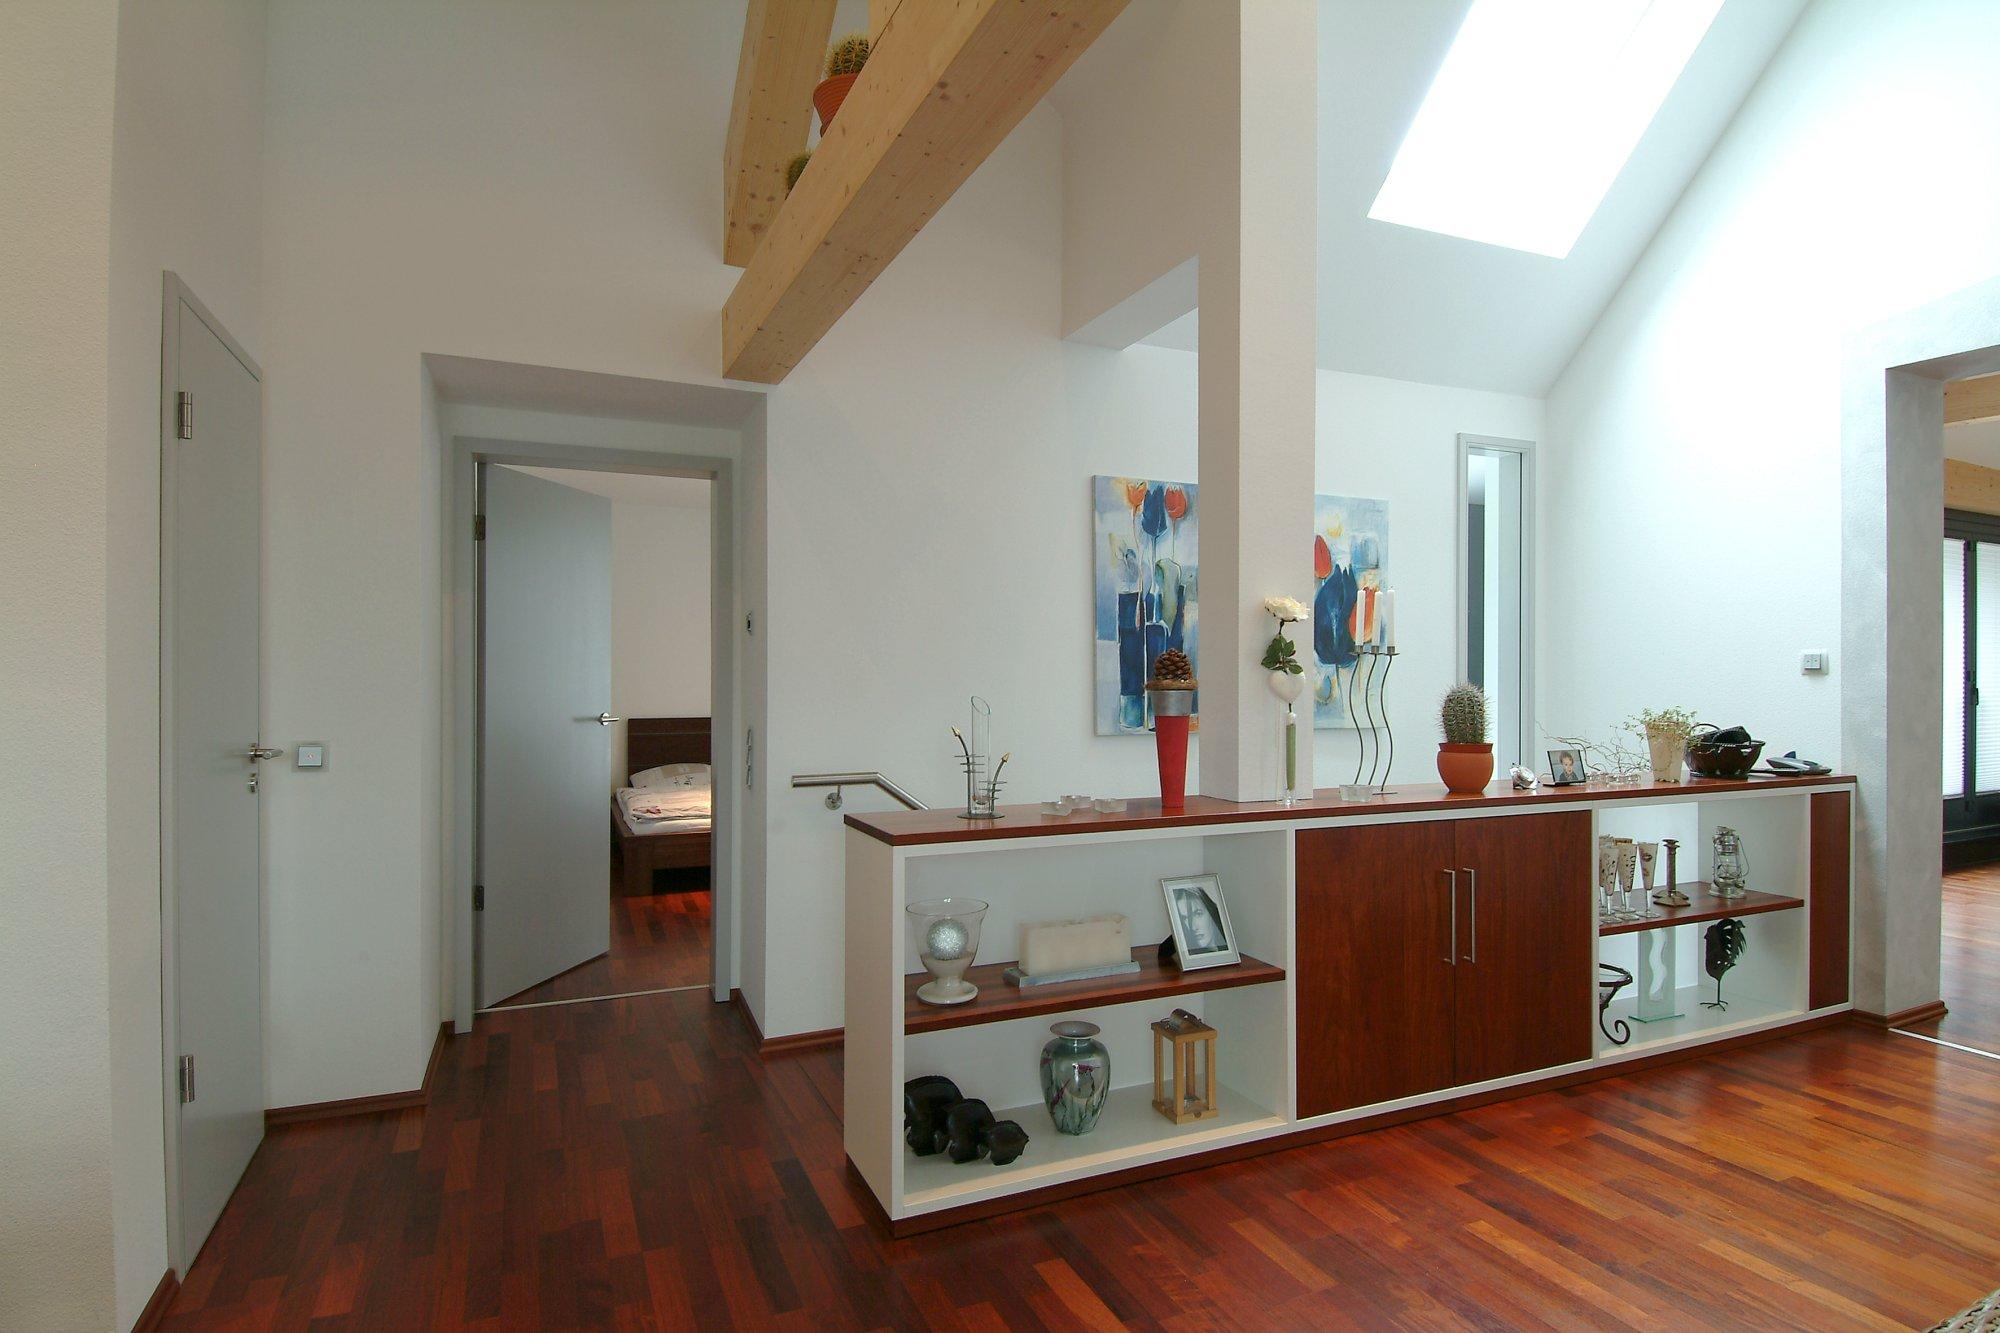 Dachausbau in Merbau, Sideboard, Türen, Parkett, Trockenbau